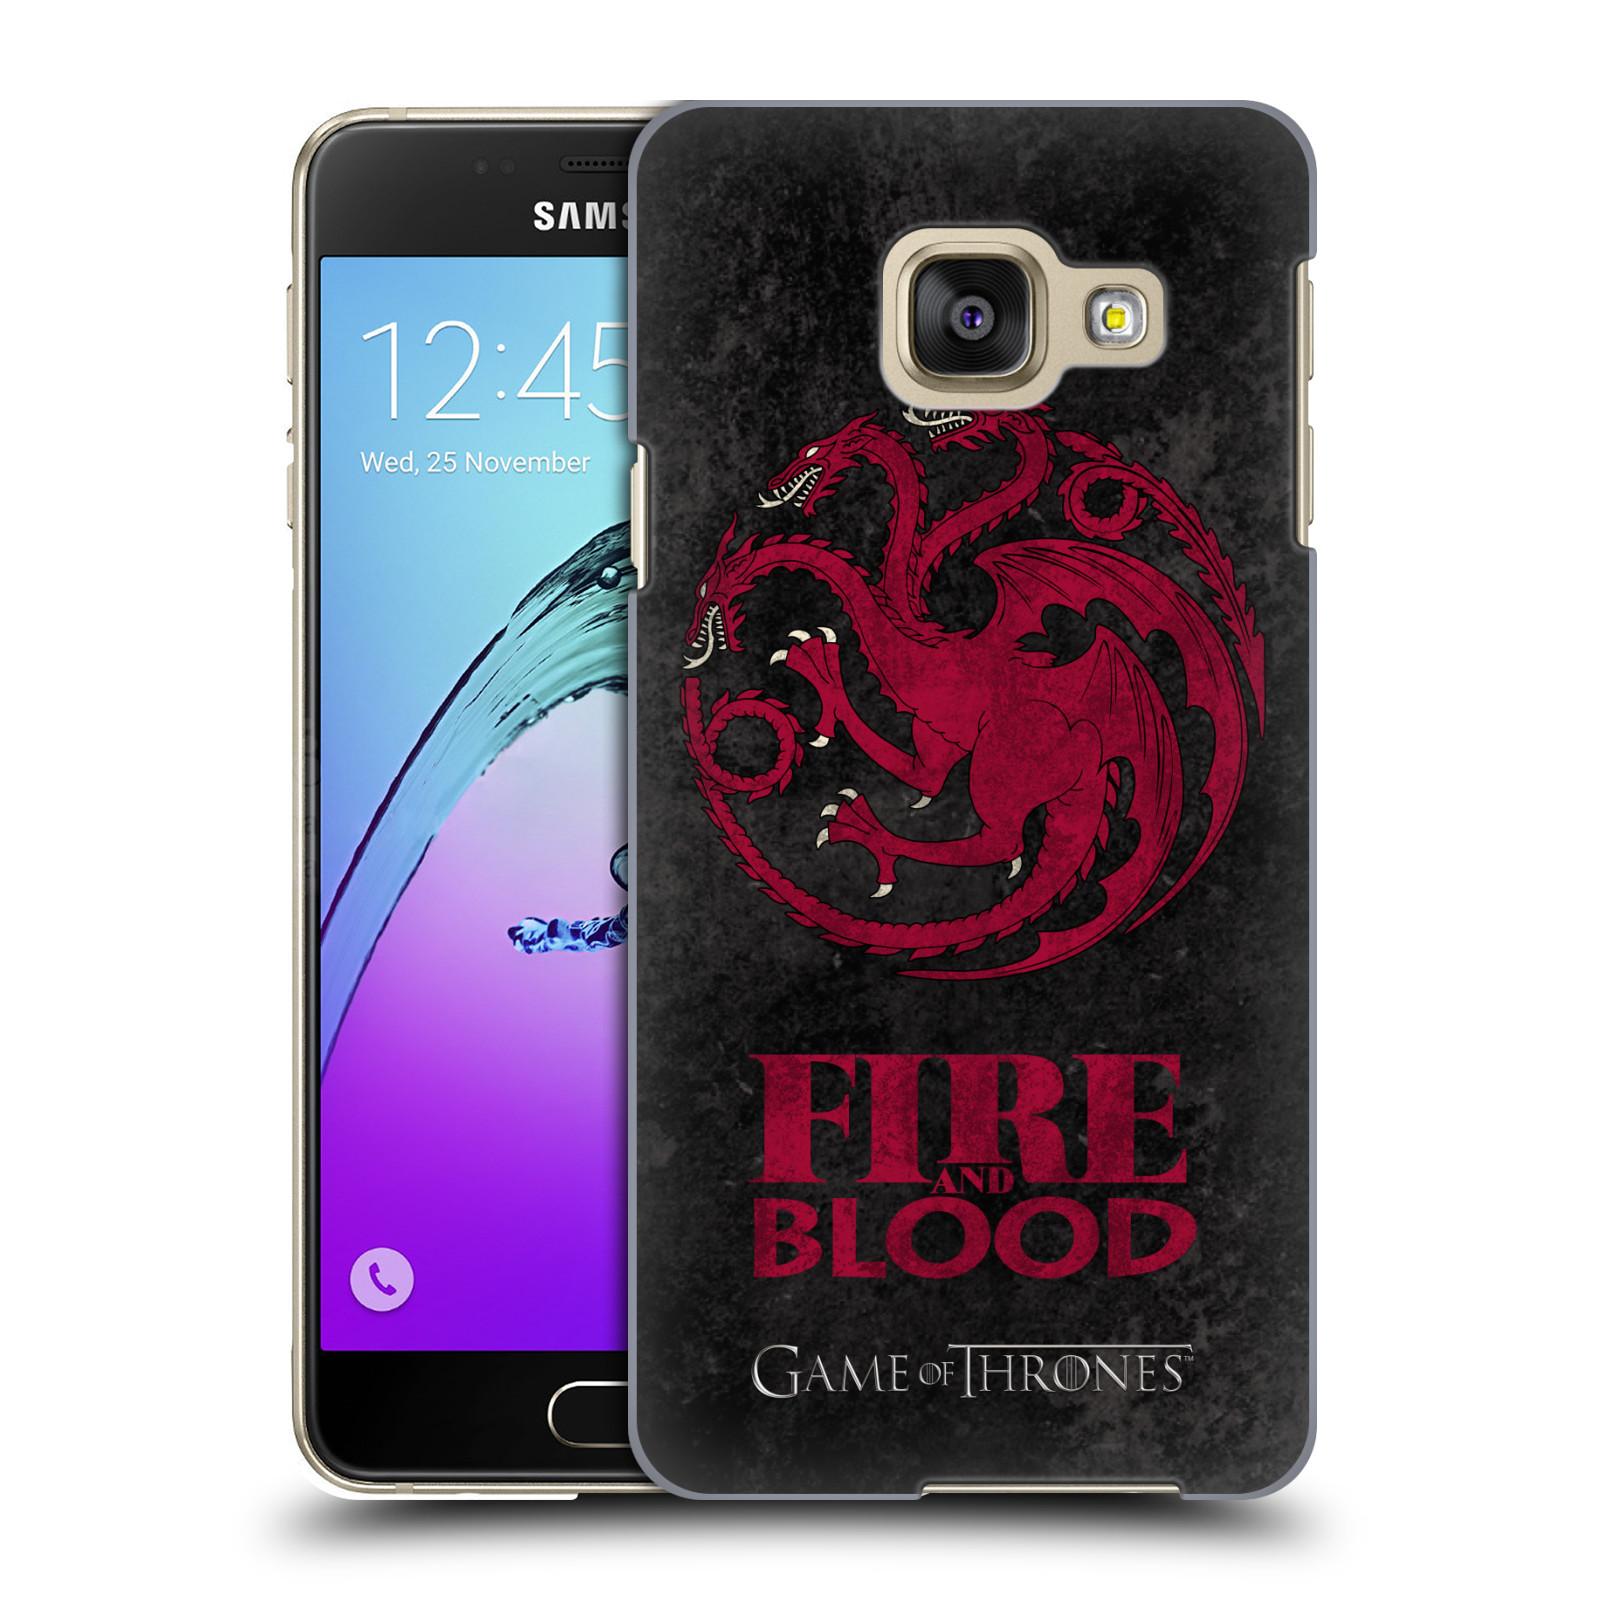 Plastové pouzdro na mobil Samsung Galaxy A3 (2016) HEAD CASE Hra o trůny - Sigils Targaryen - Fire and Blood